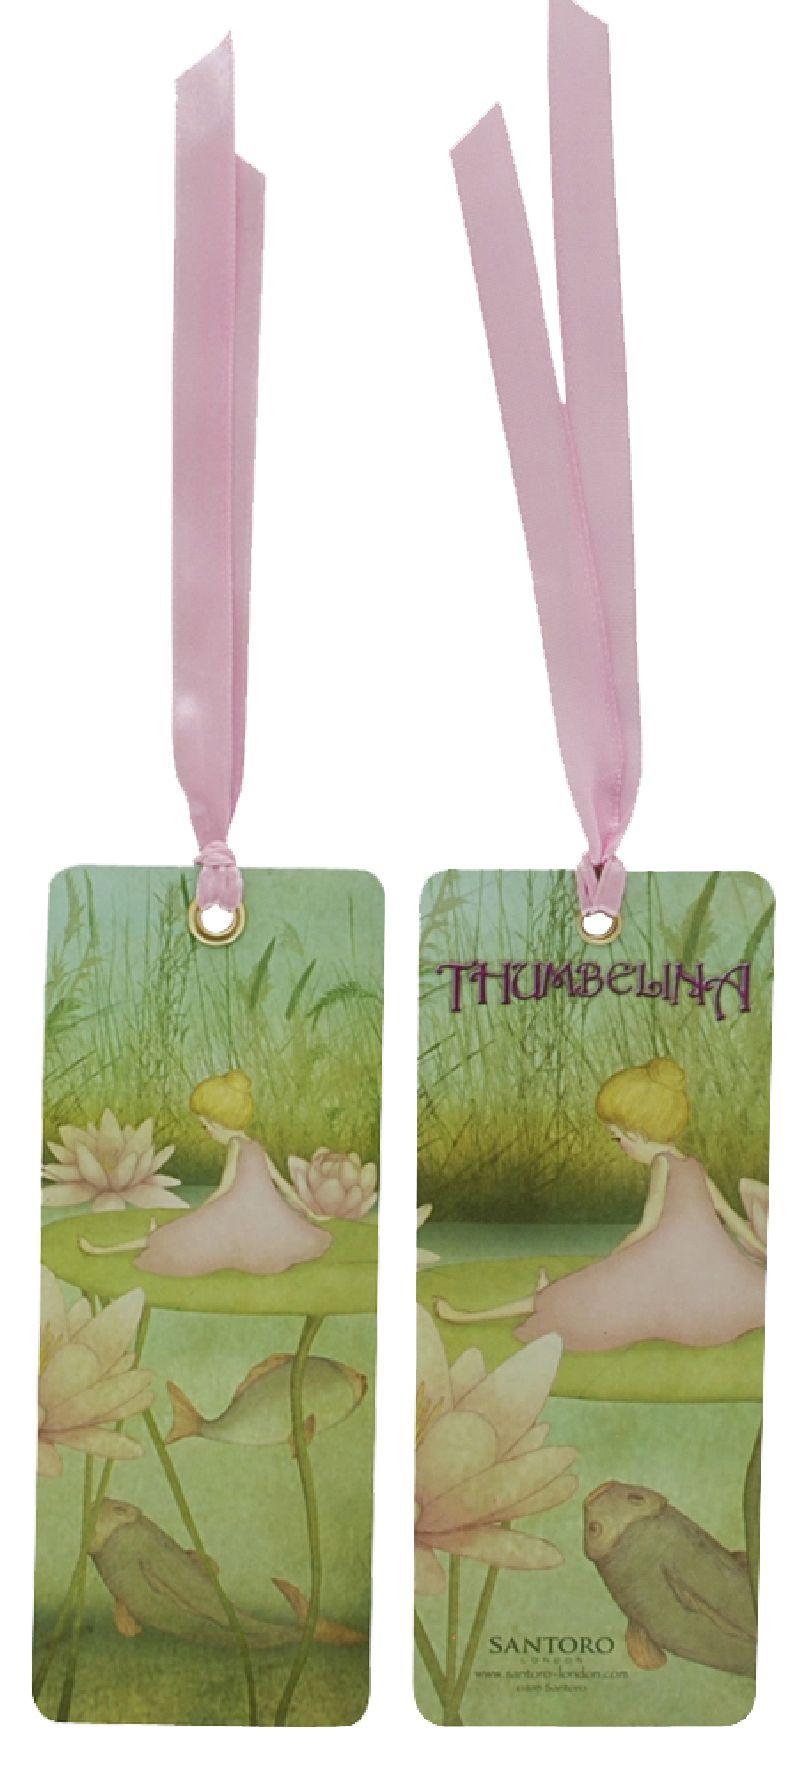 Semn de carte Thumbelina